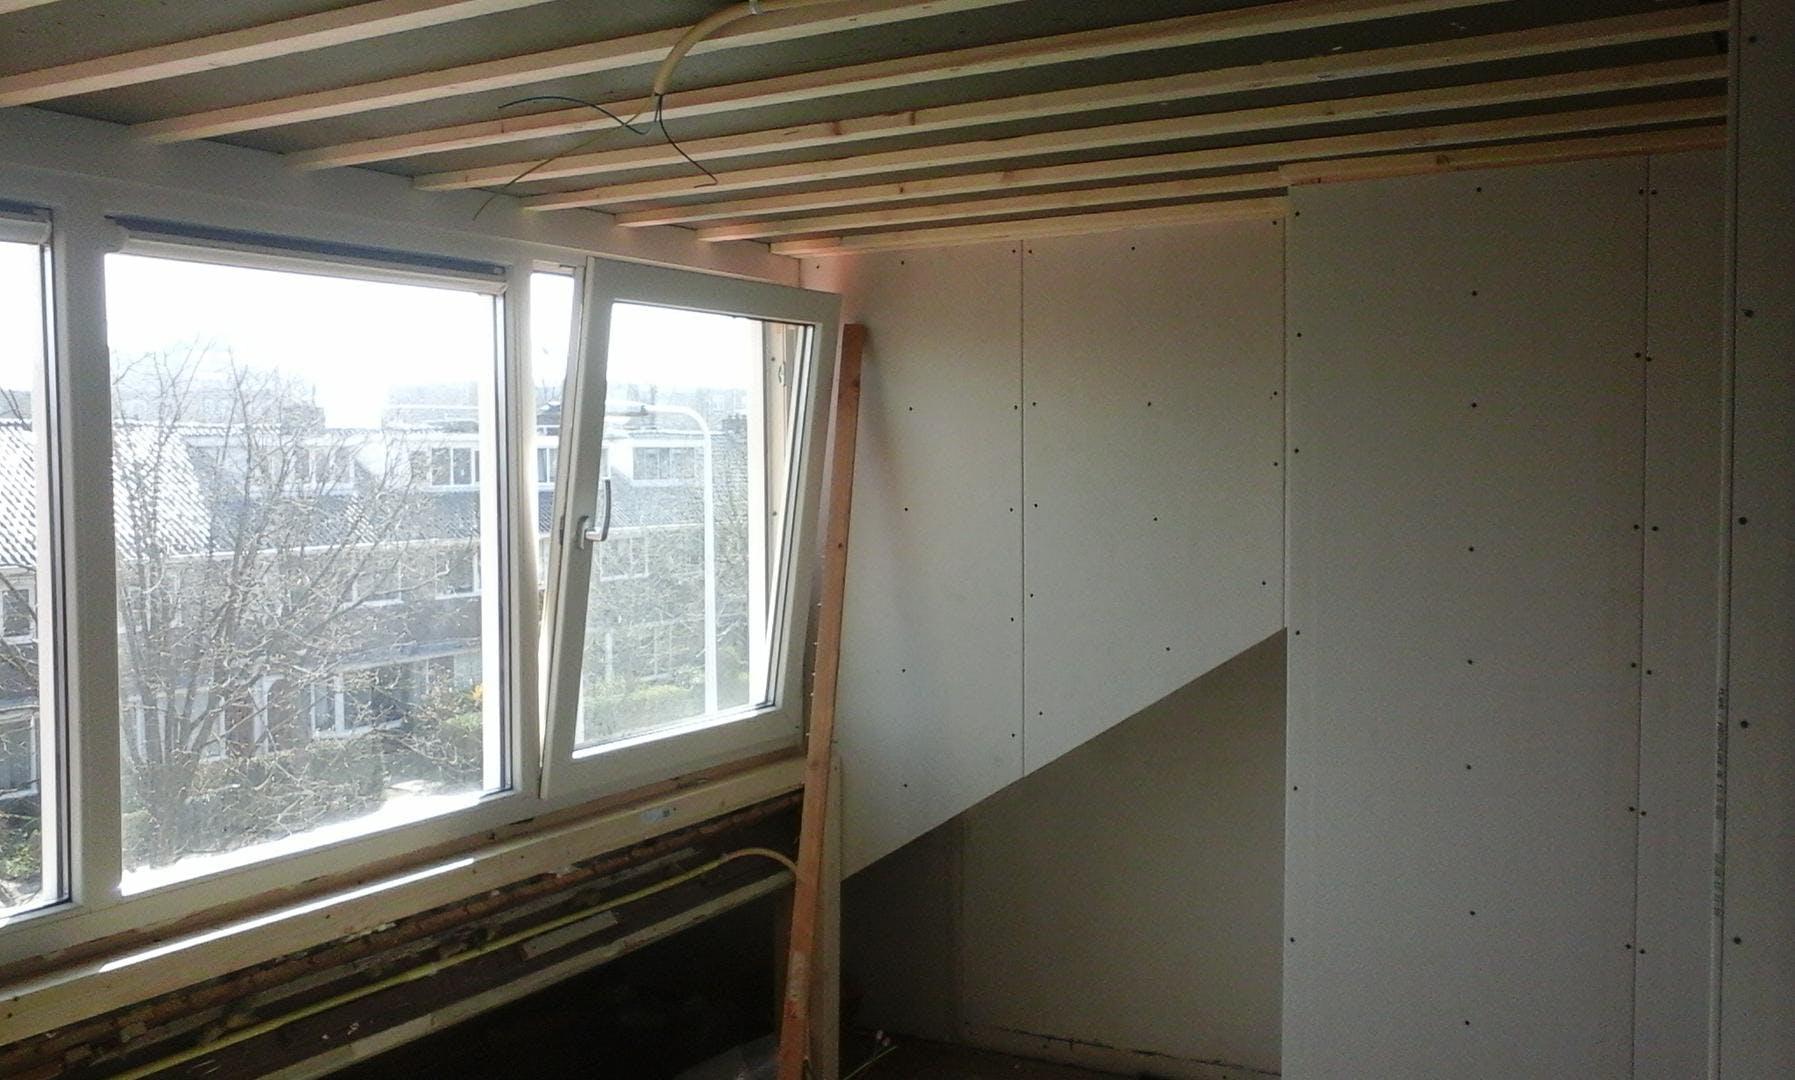 Kinderkamers Op Zolder : Zolder verbouwen tot slaapkamer opslag of werkkamer frank wouterse